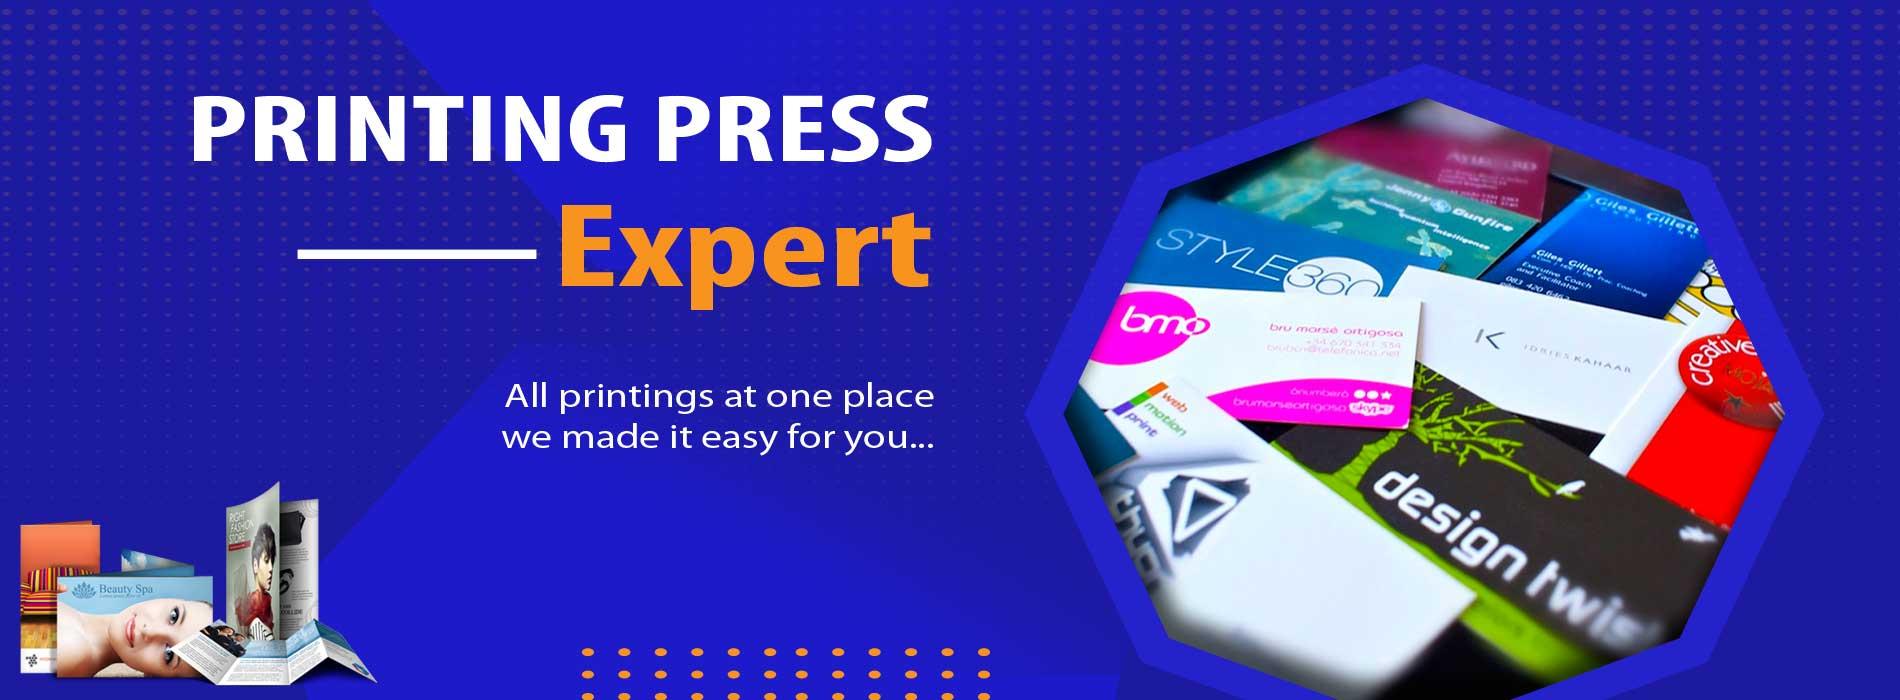 1 Printing Press